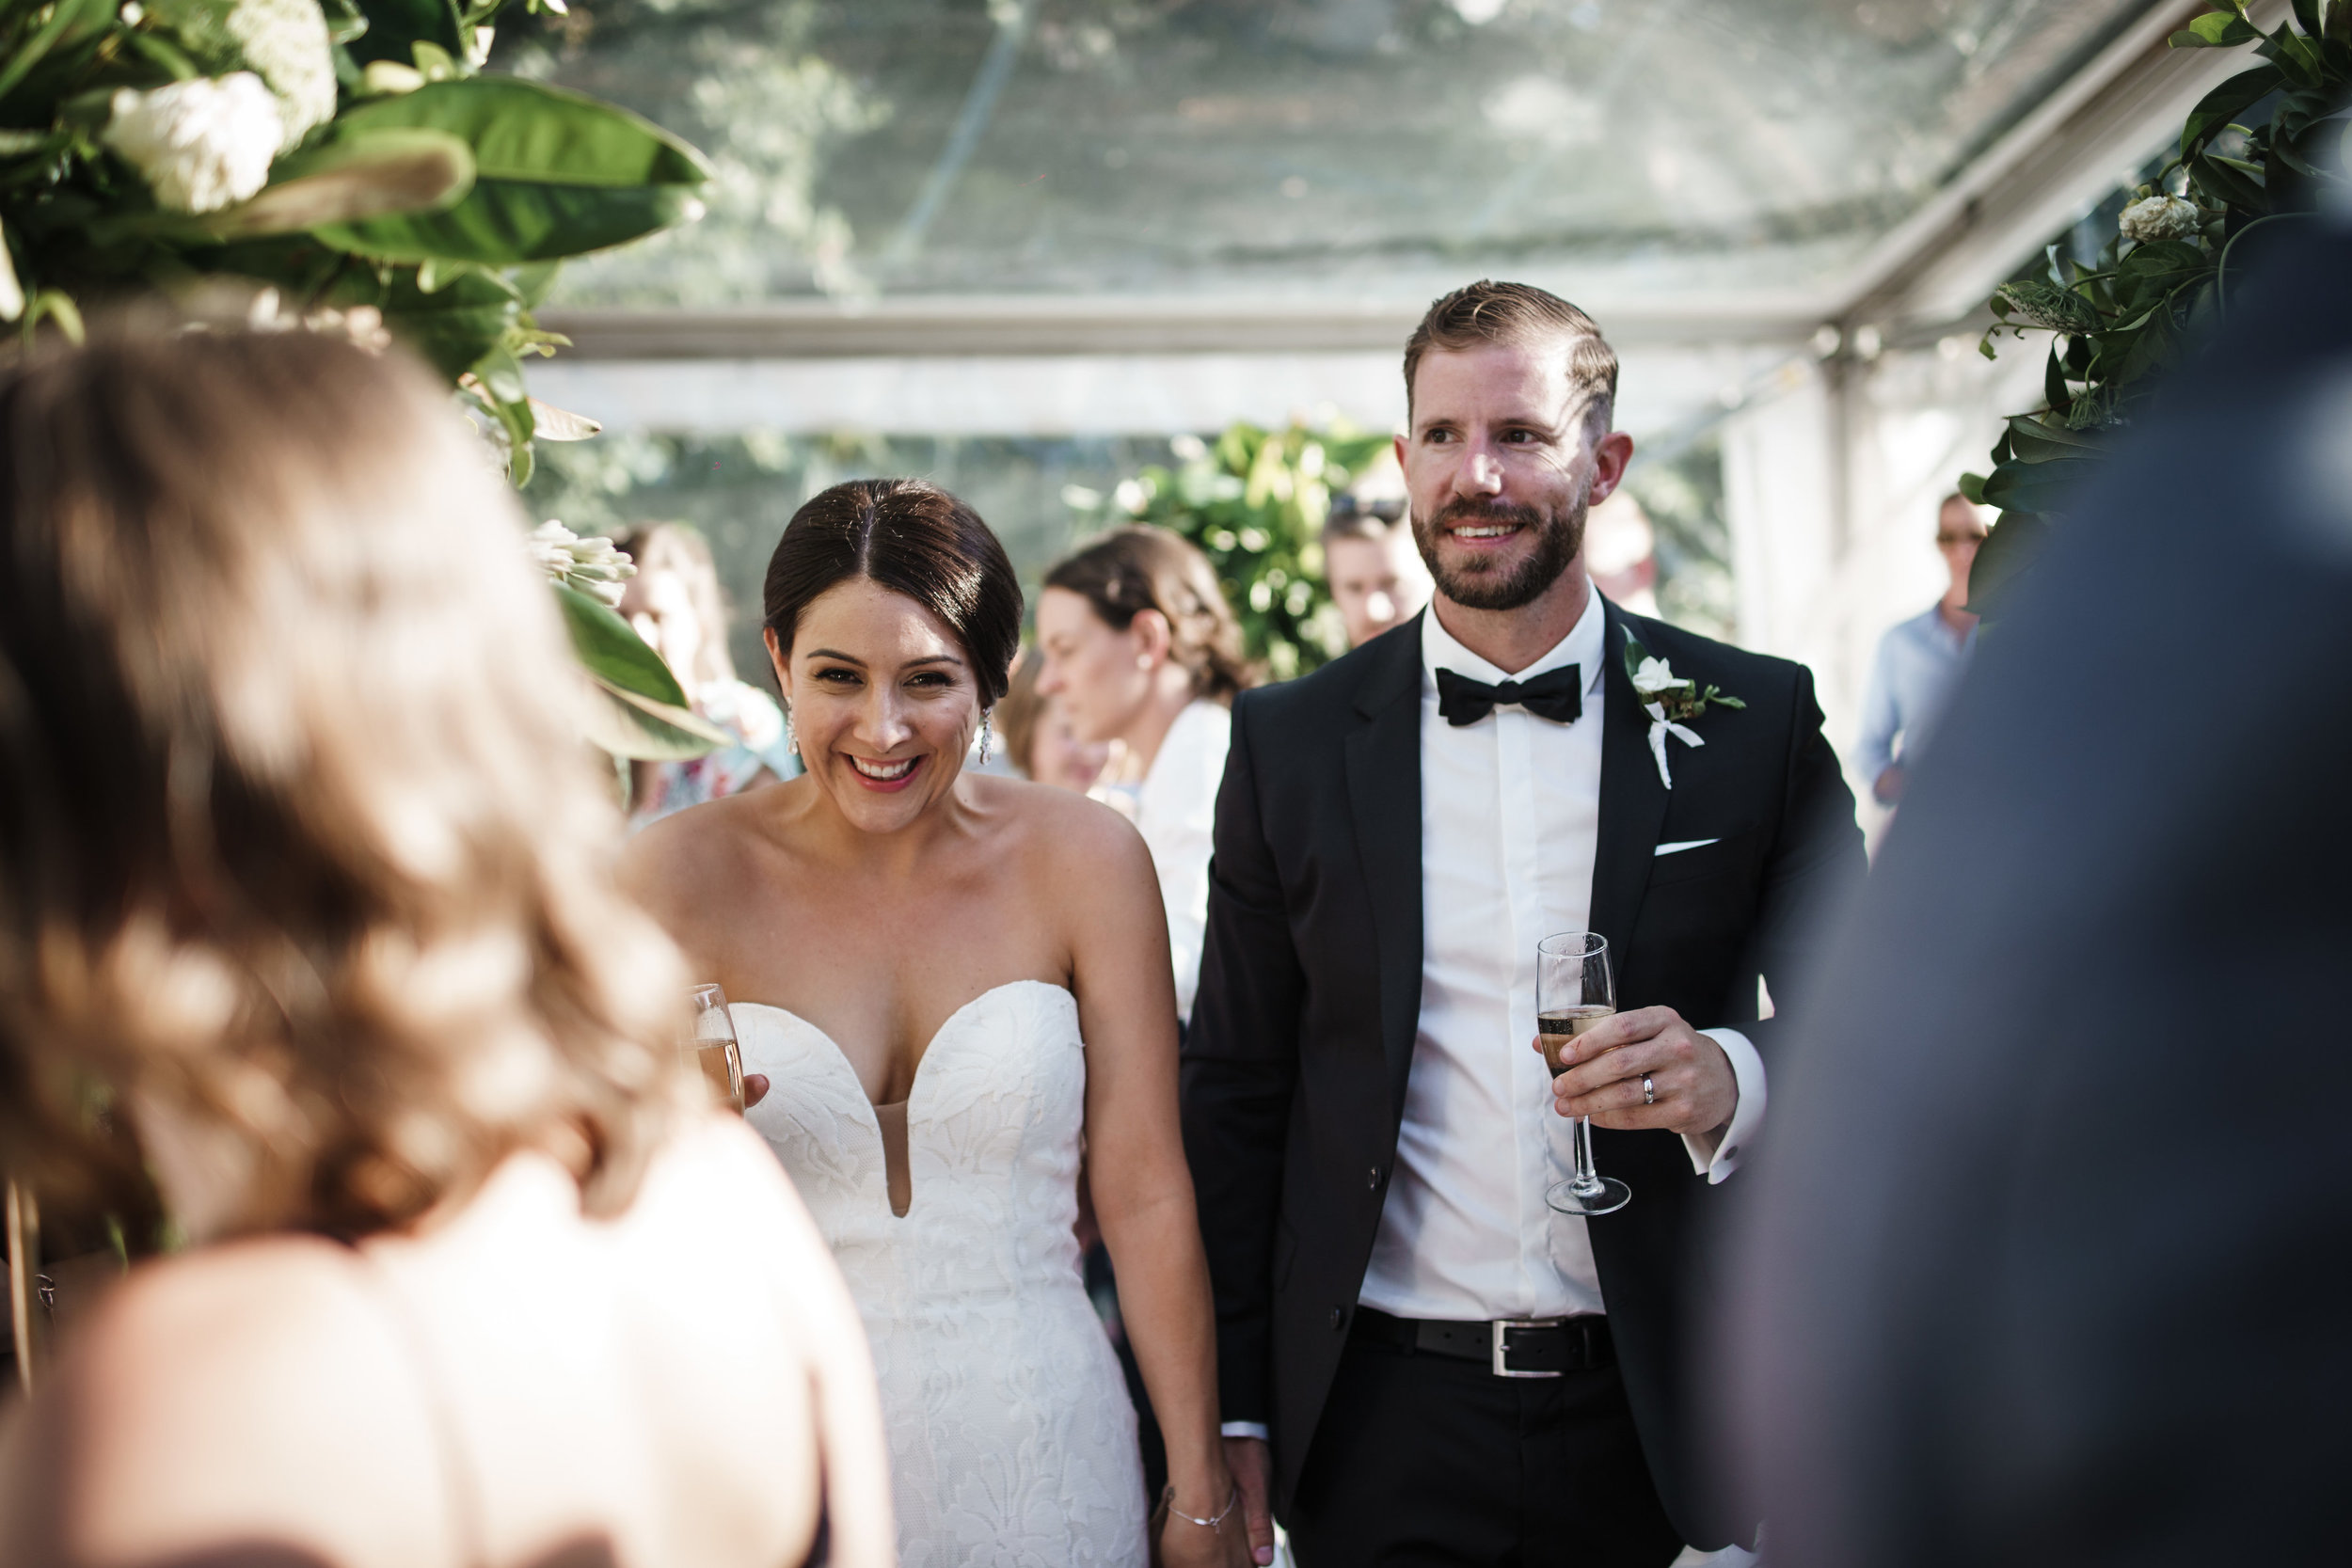 Carclew_house_wedding_Israel_Baldago_Photography-623.jpg